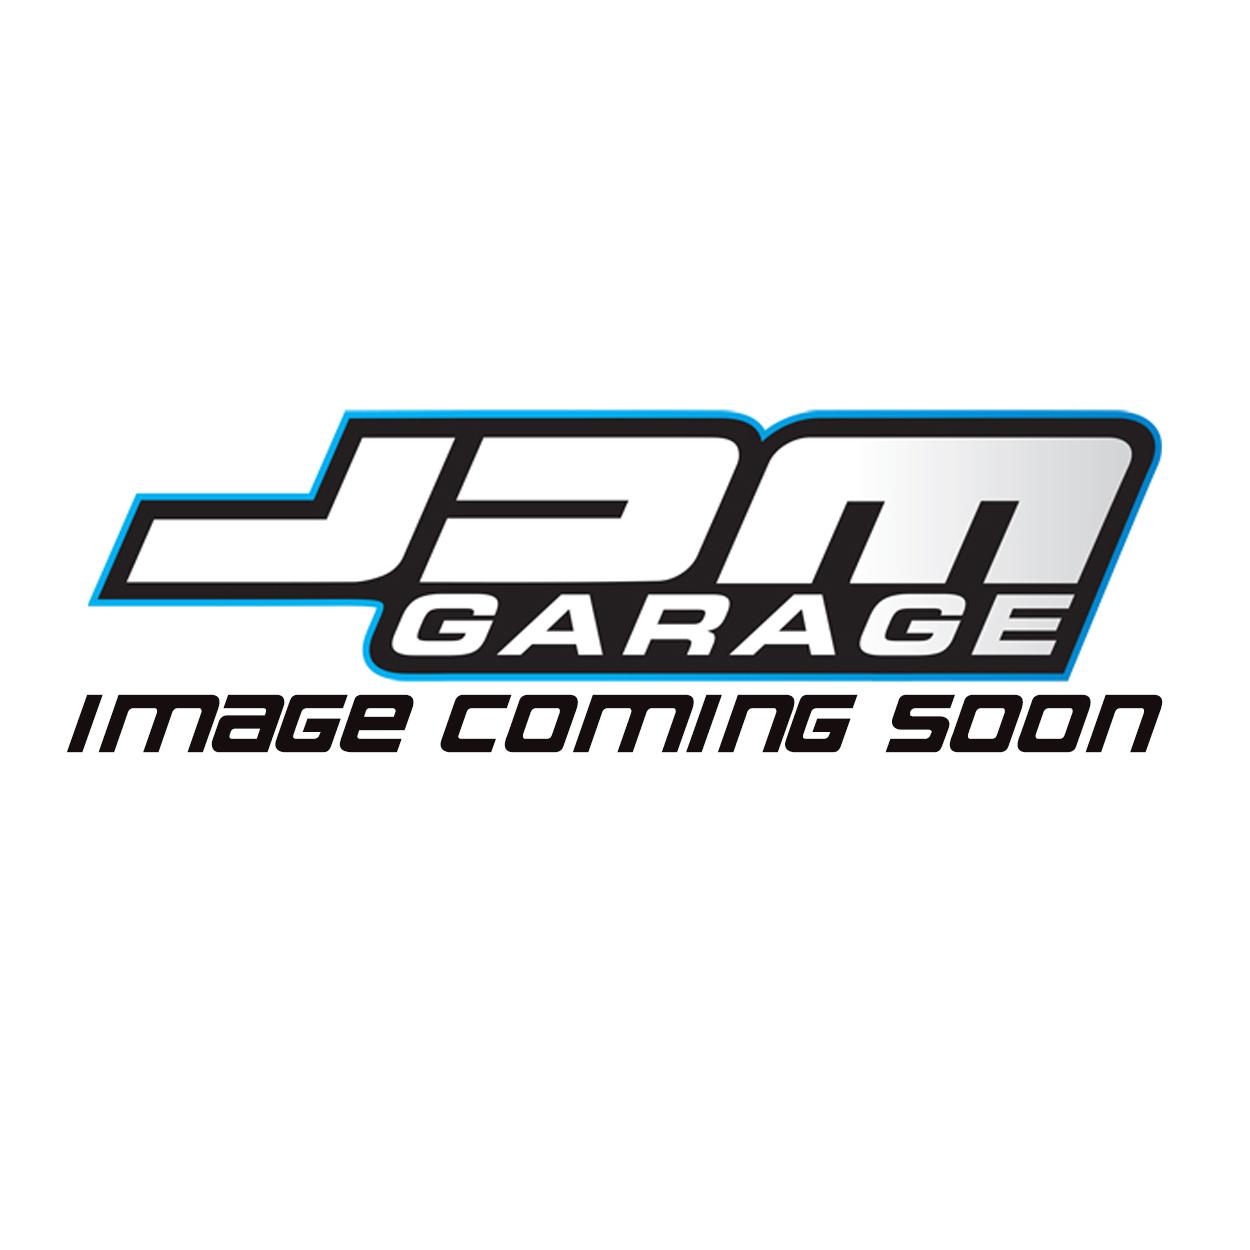 Genuine Nissan Flywheel Dowel Pin Fits Nissan Silvia S13 180SX S14 200SX S15 Pulsar GTIR FairladyZ 300ZX 12313-10600